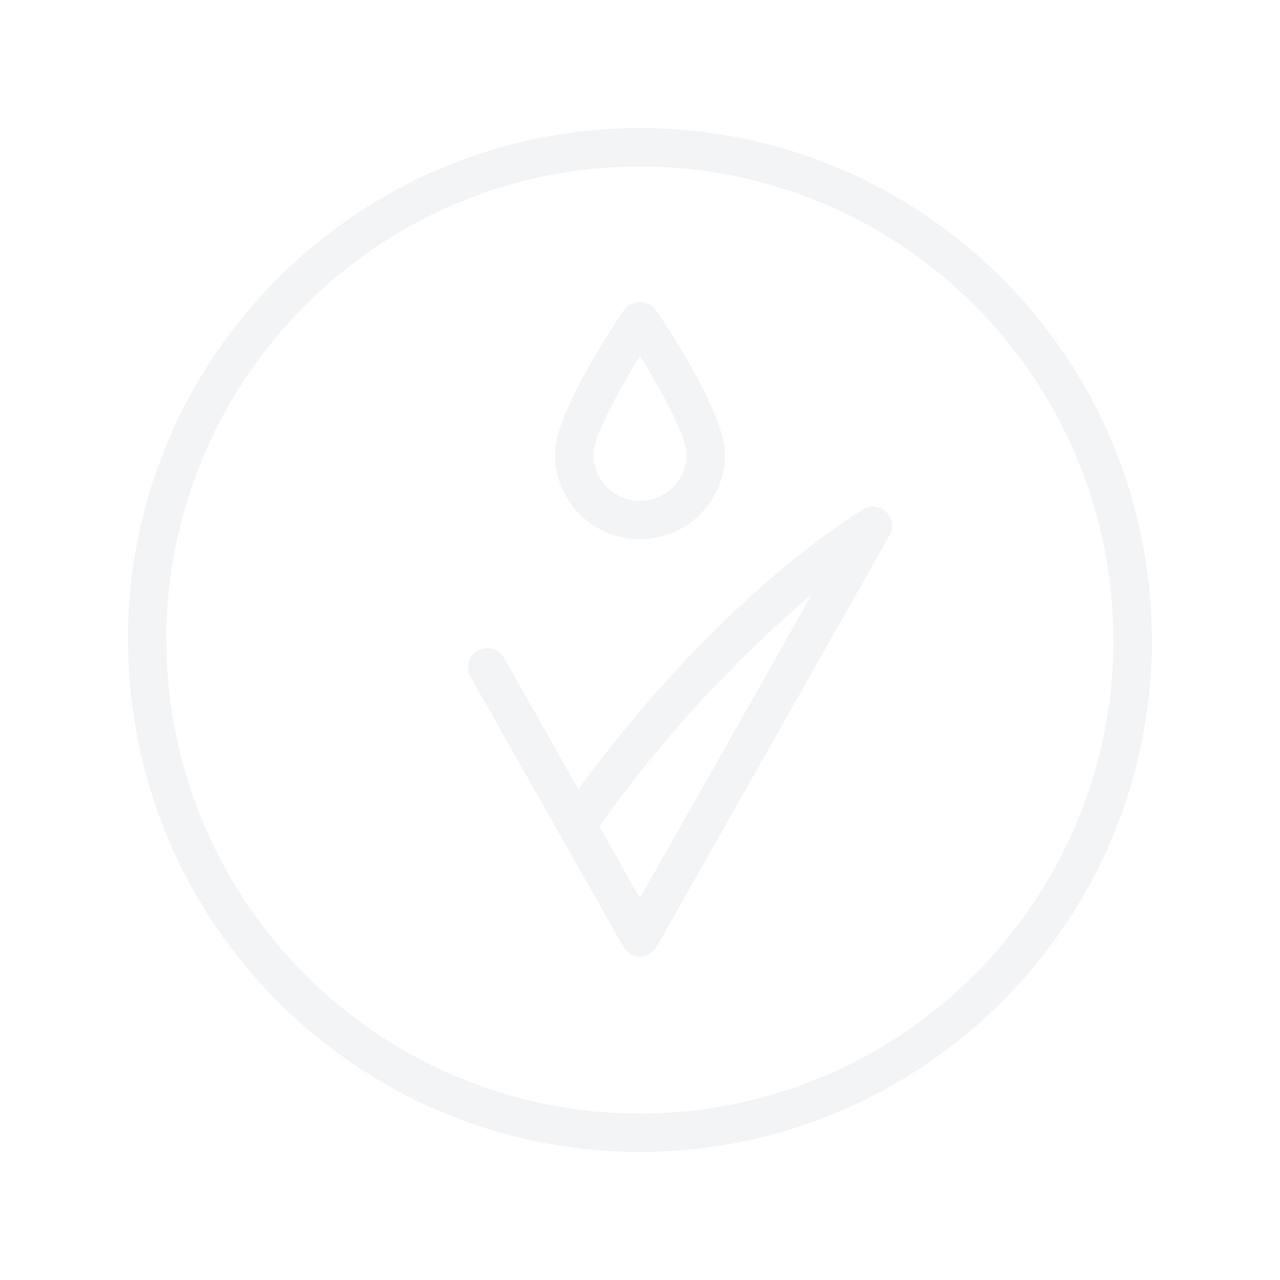 AVENE Very High Protection Anti-Aging Suncare SPF50 50ml